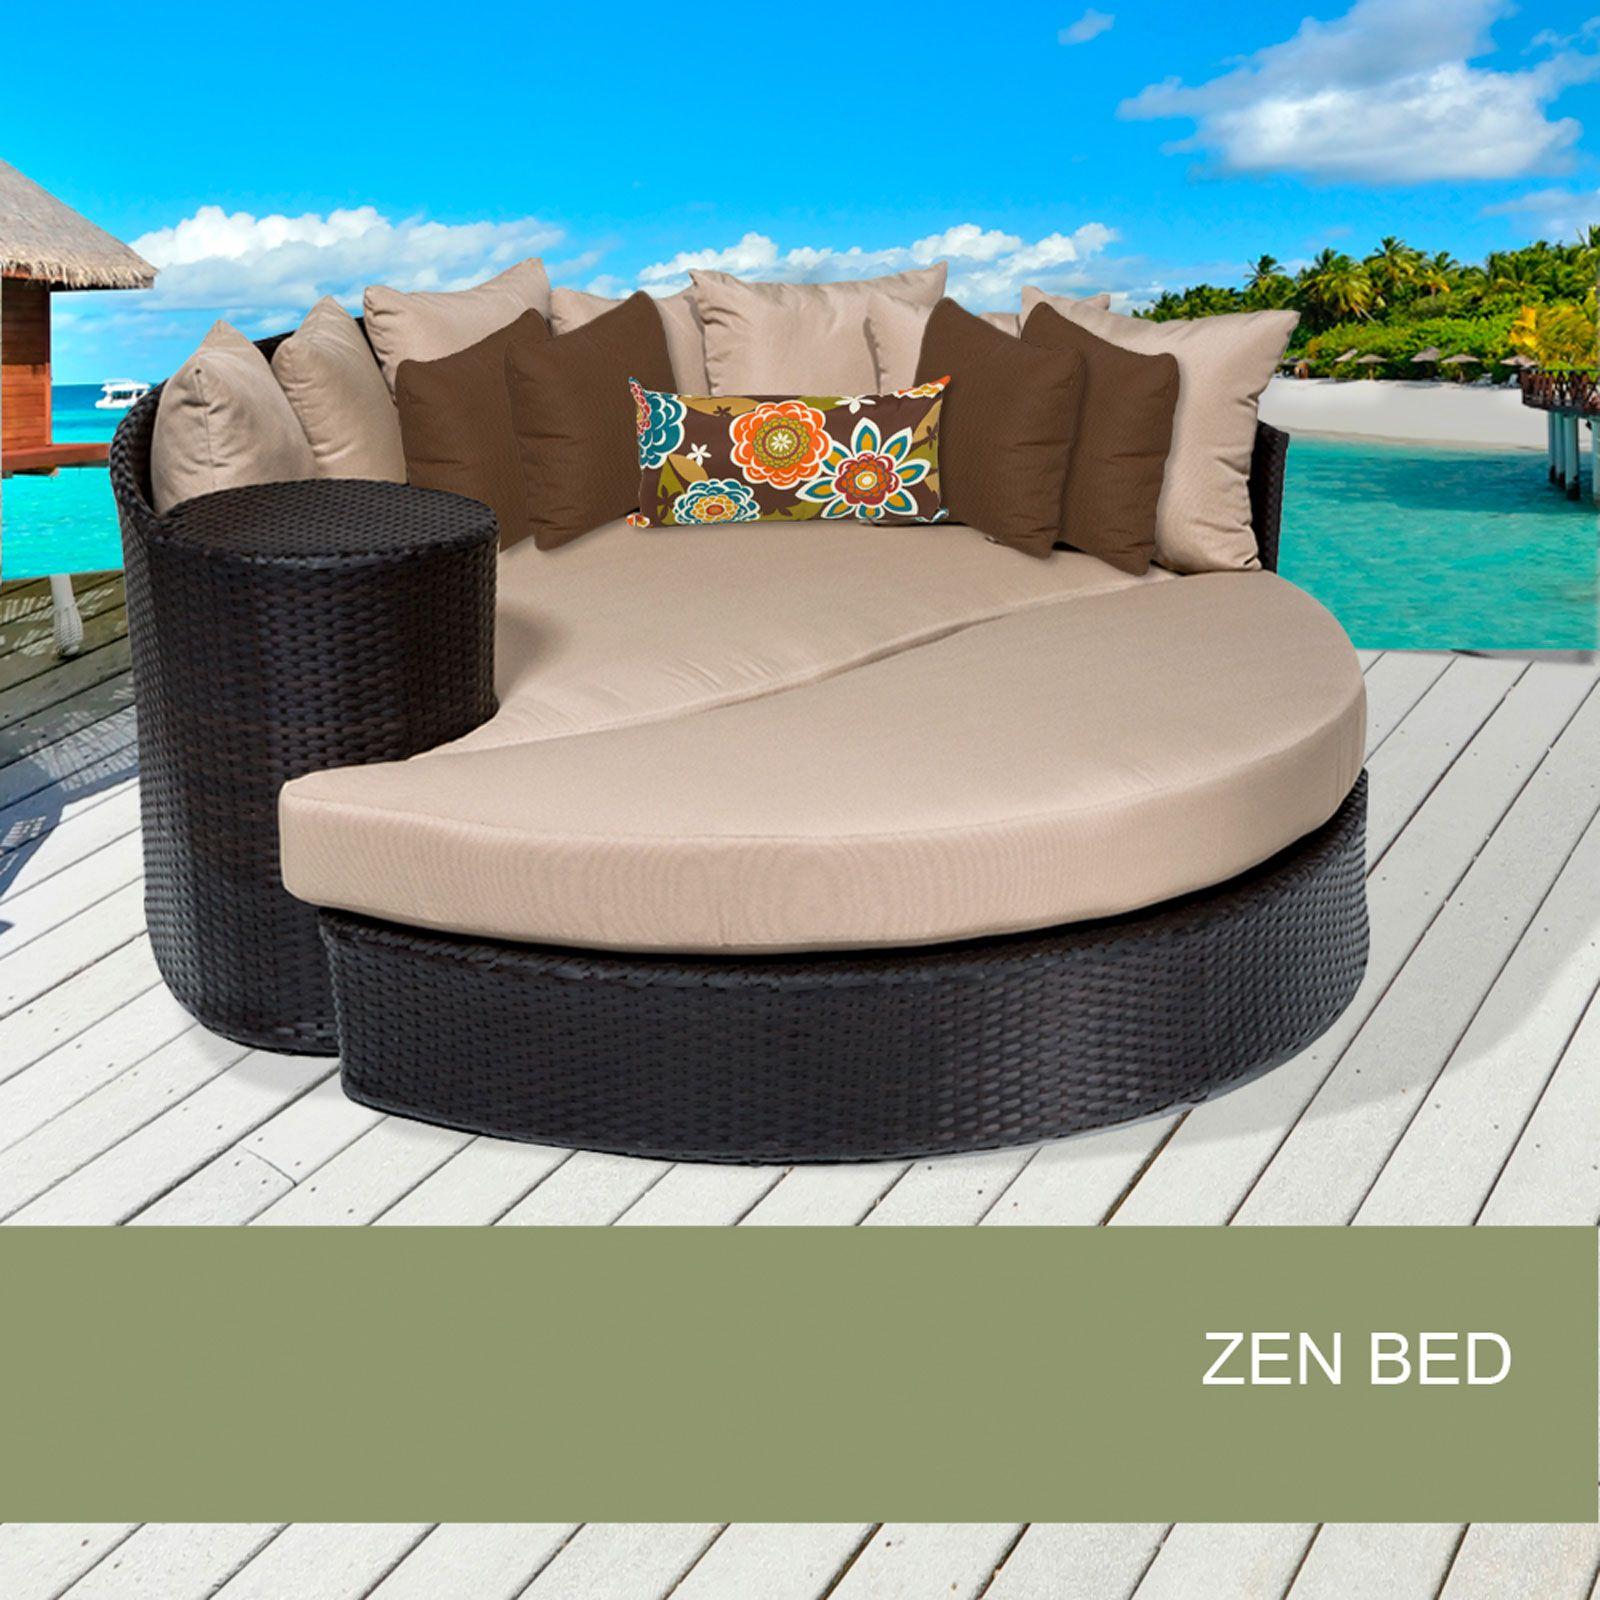 Zen Circular Sun Bed   Outdoor Wicker Patio Furniture   Design Furnishings